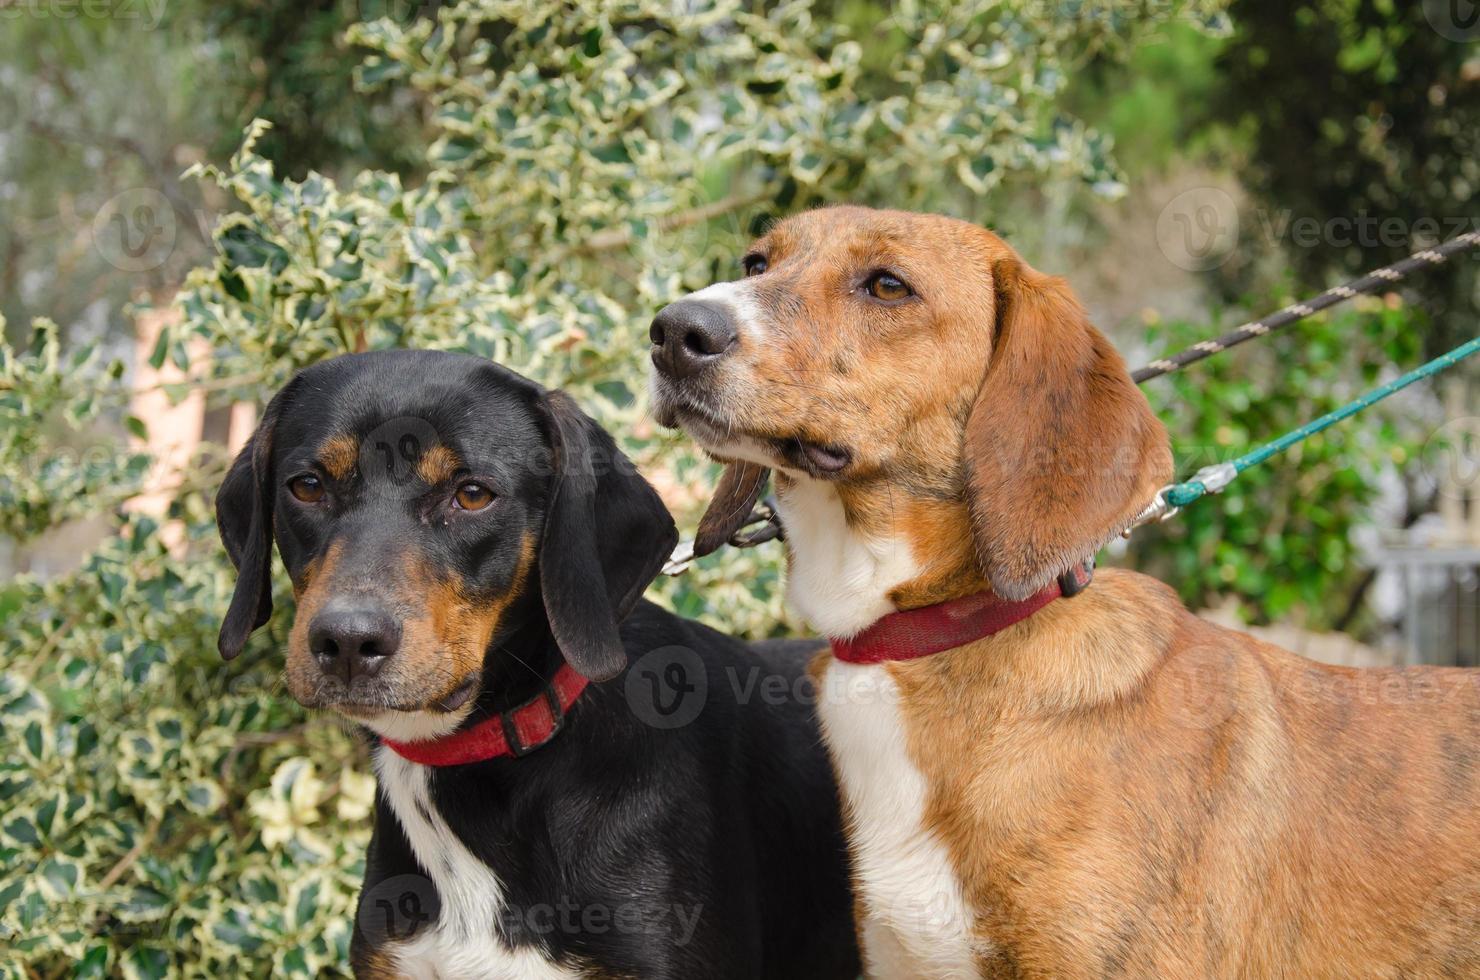 due cani da caccia foto